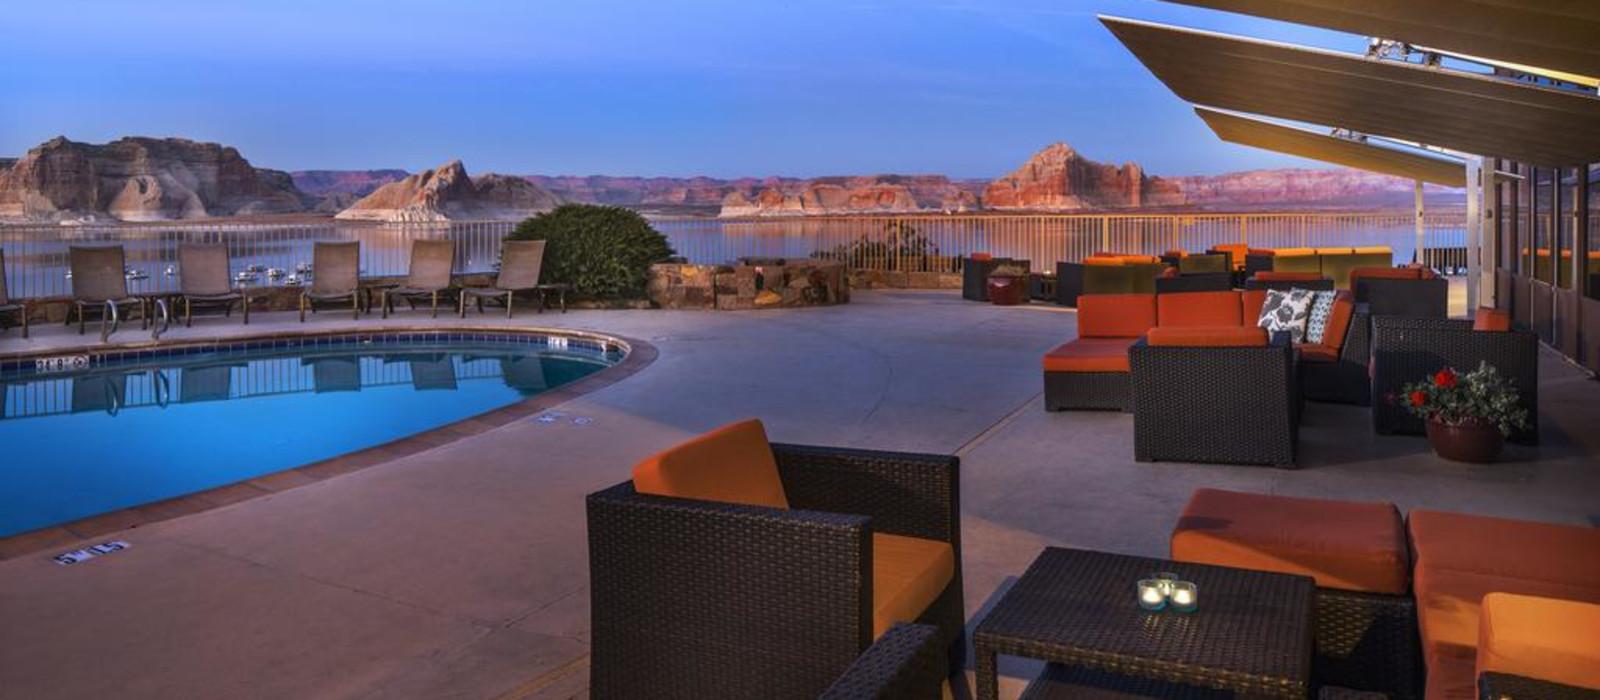 Hotel Lake Powell Resort Marina USA